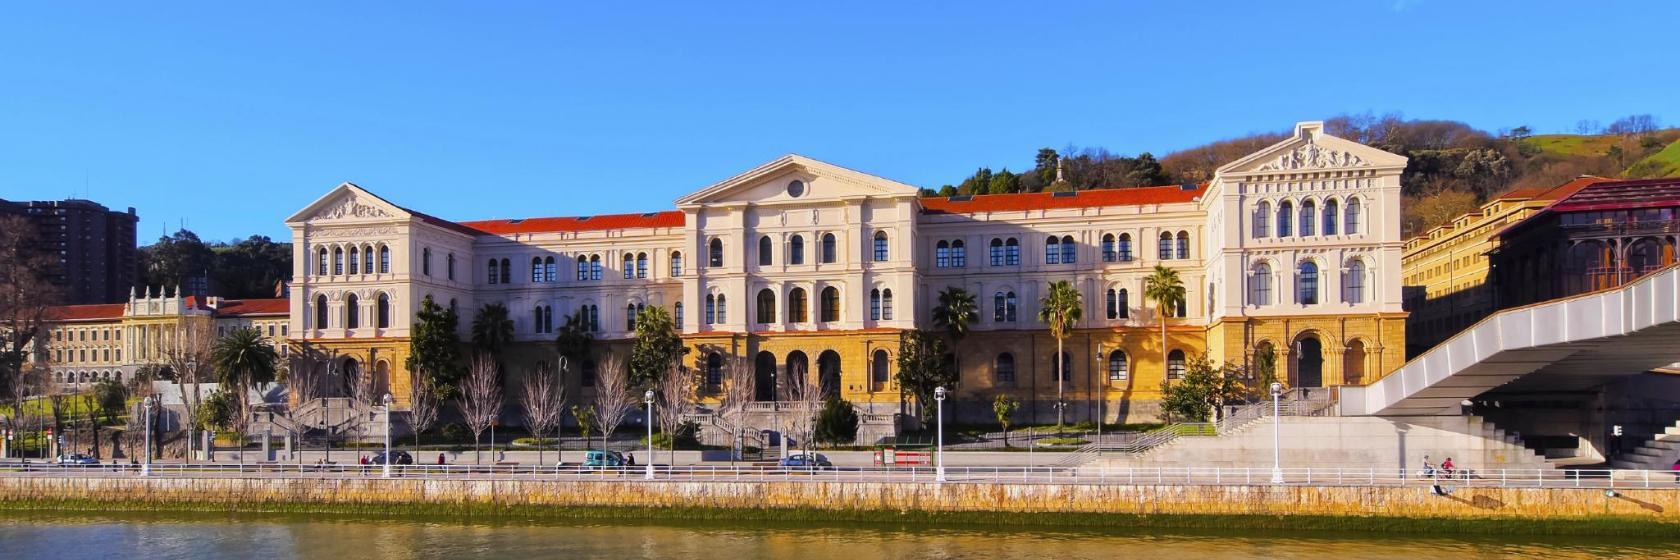 The 10 best hotels near University of Deusto in Bilbao, Spain